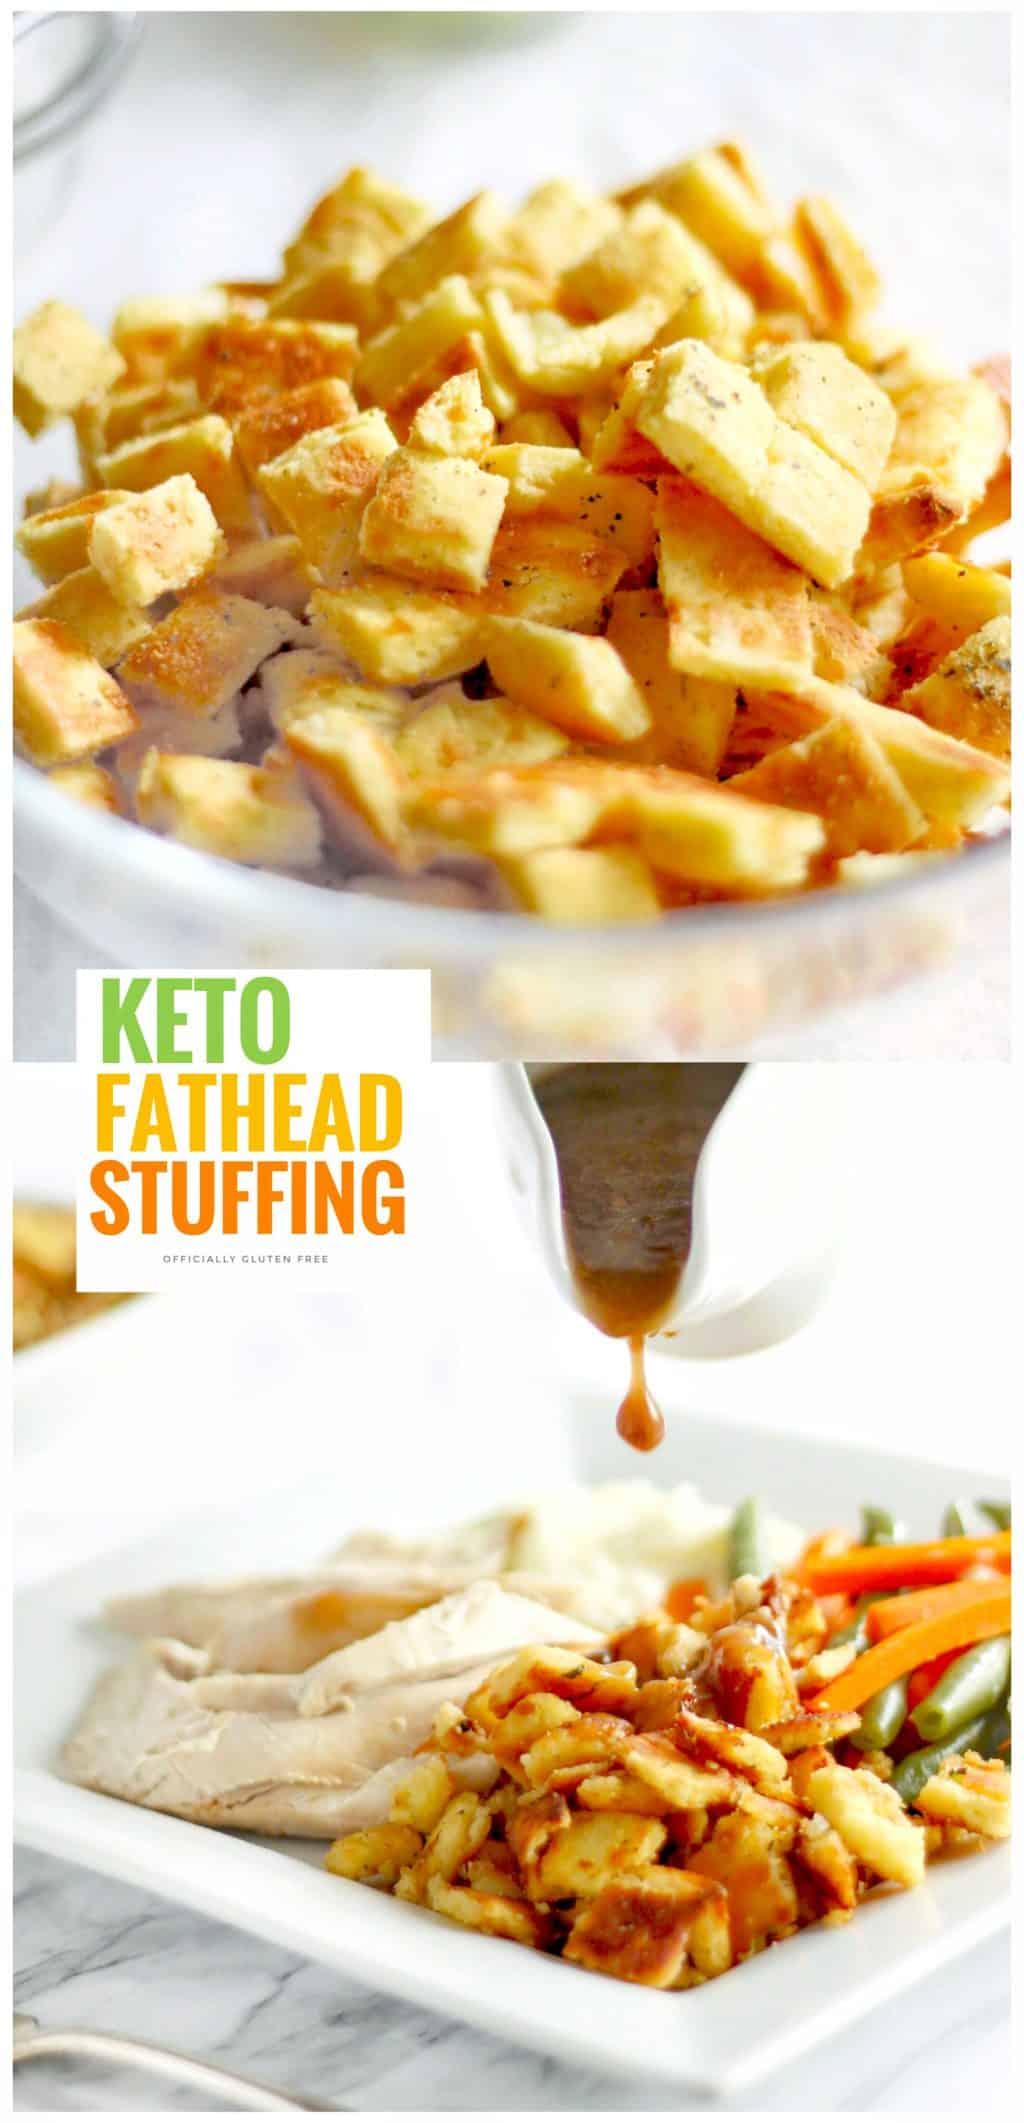 Keto Fathead Stuffing